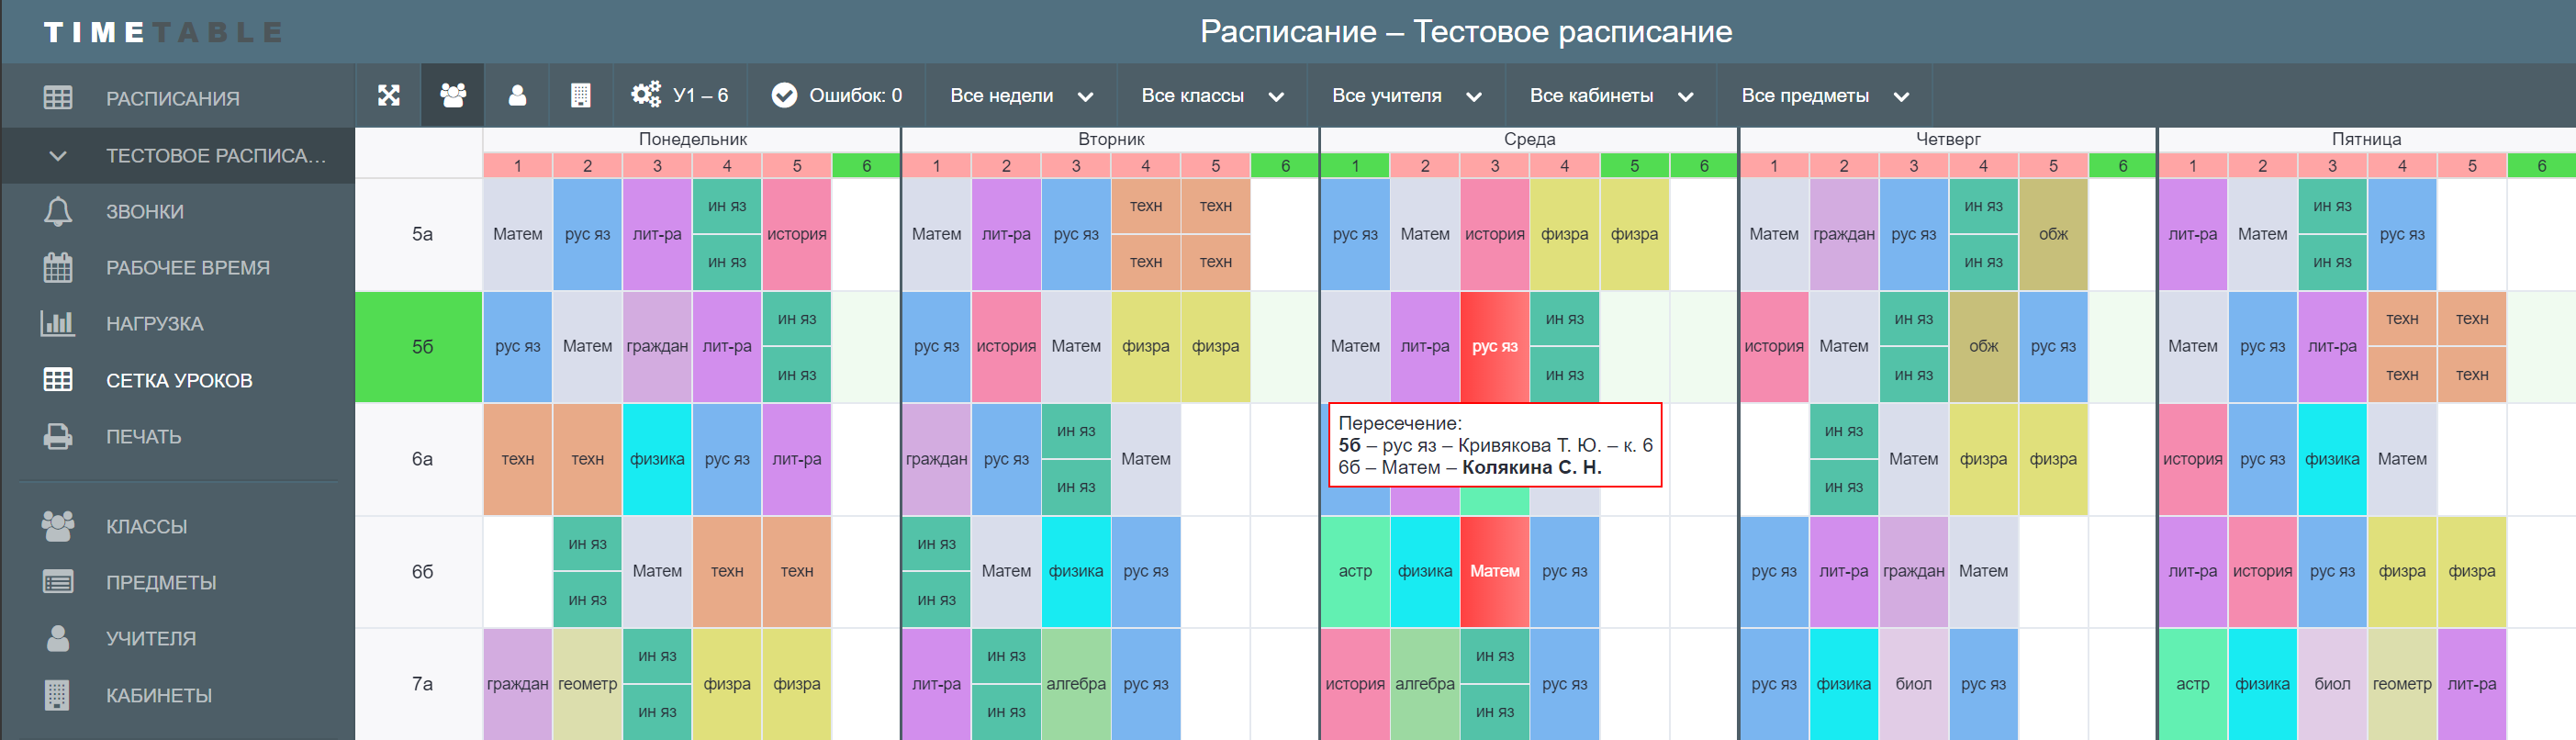 5ea17cb3ffcc13e1c746144f_header-table.png